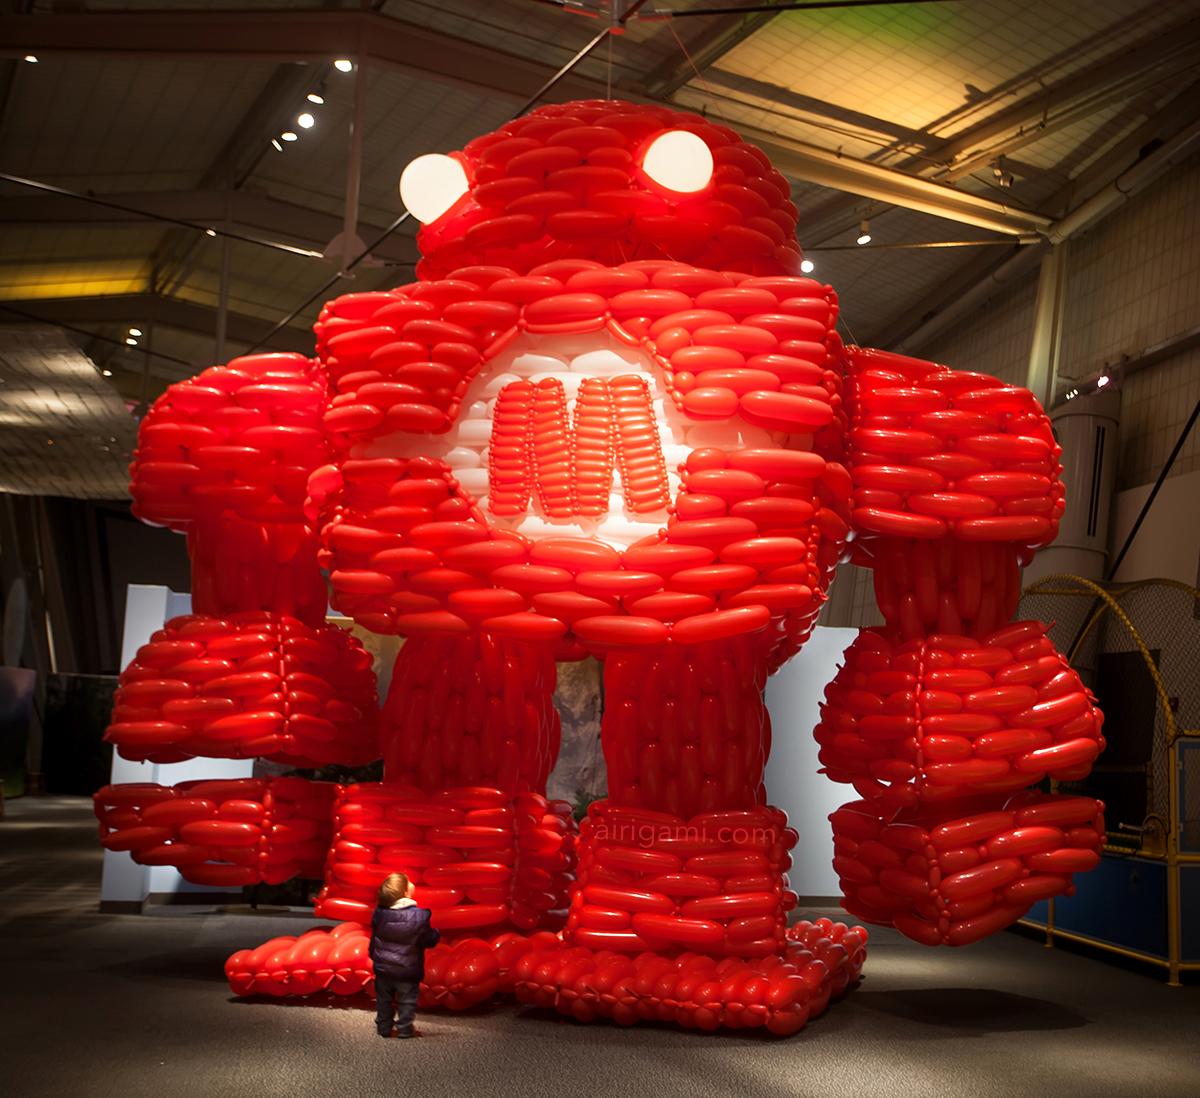 Airigami-balloon-Makey-maker-faire.jpg